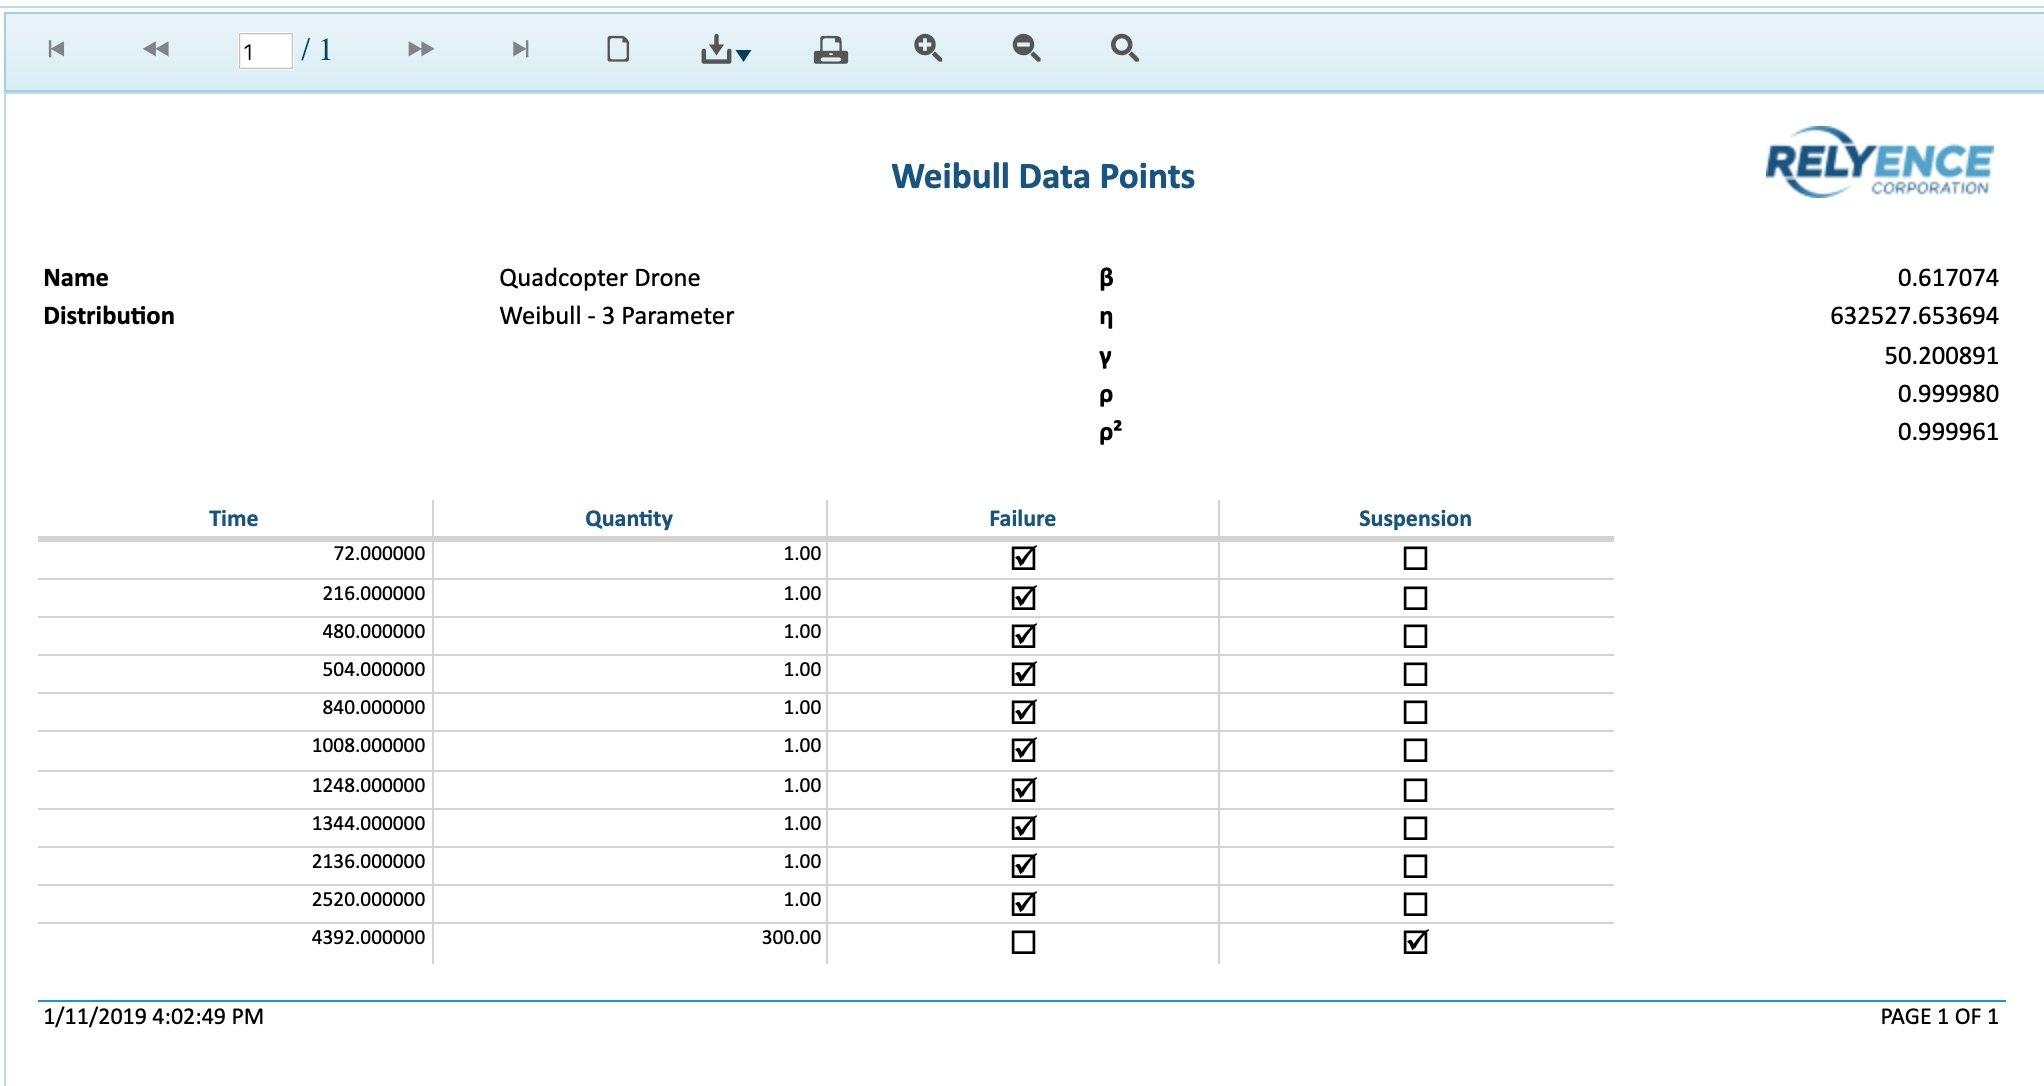 Relyence Weibull Report